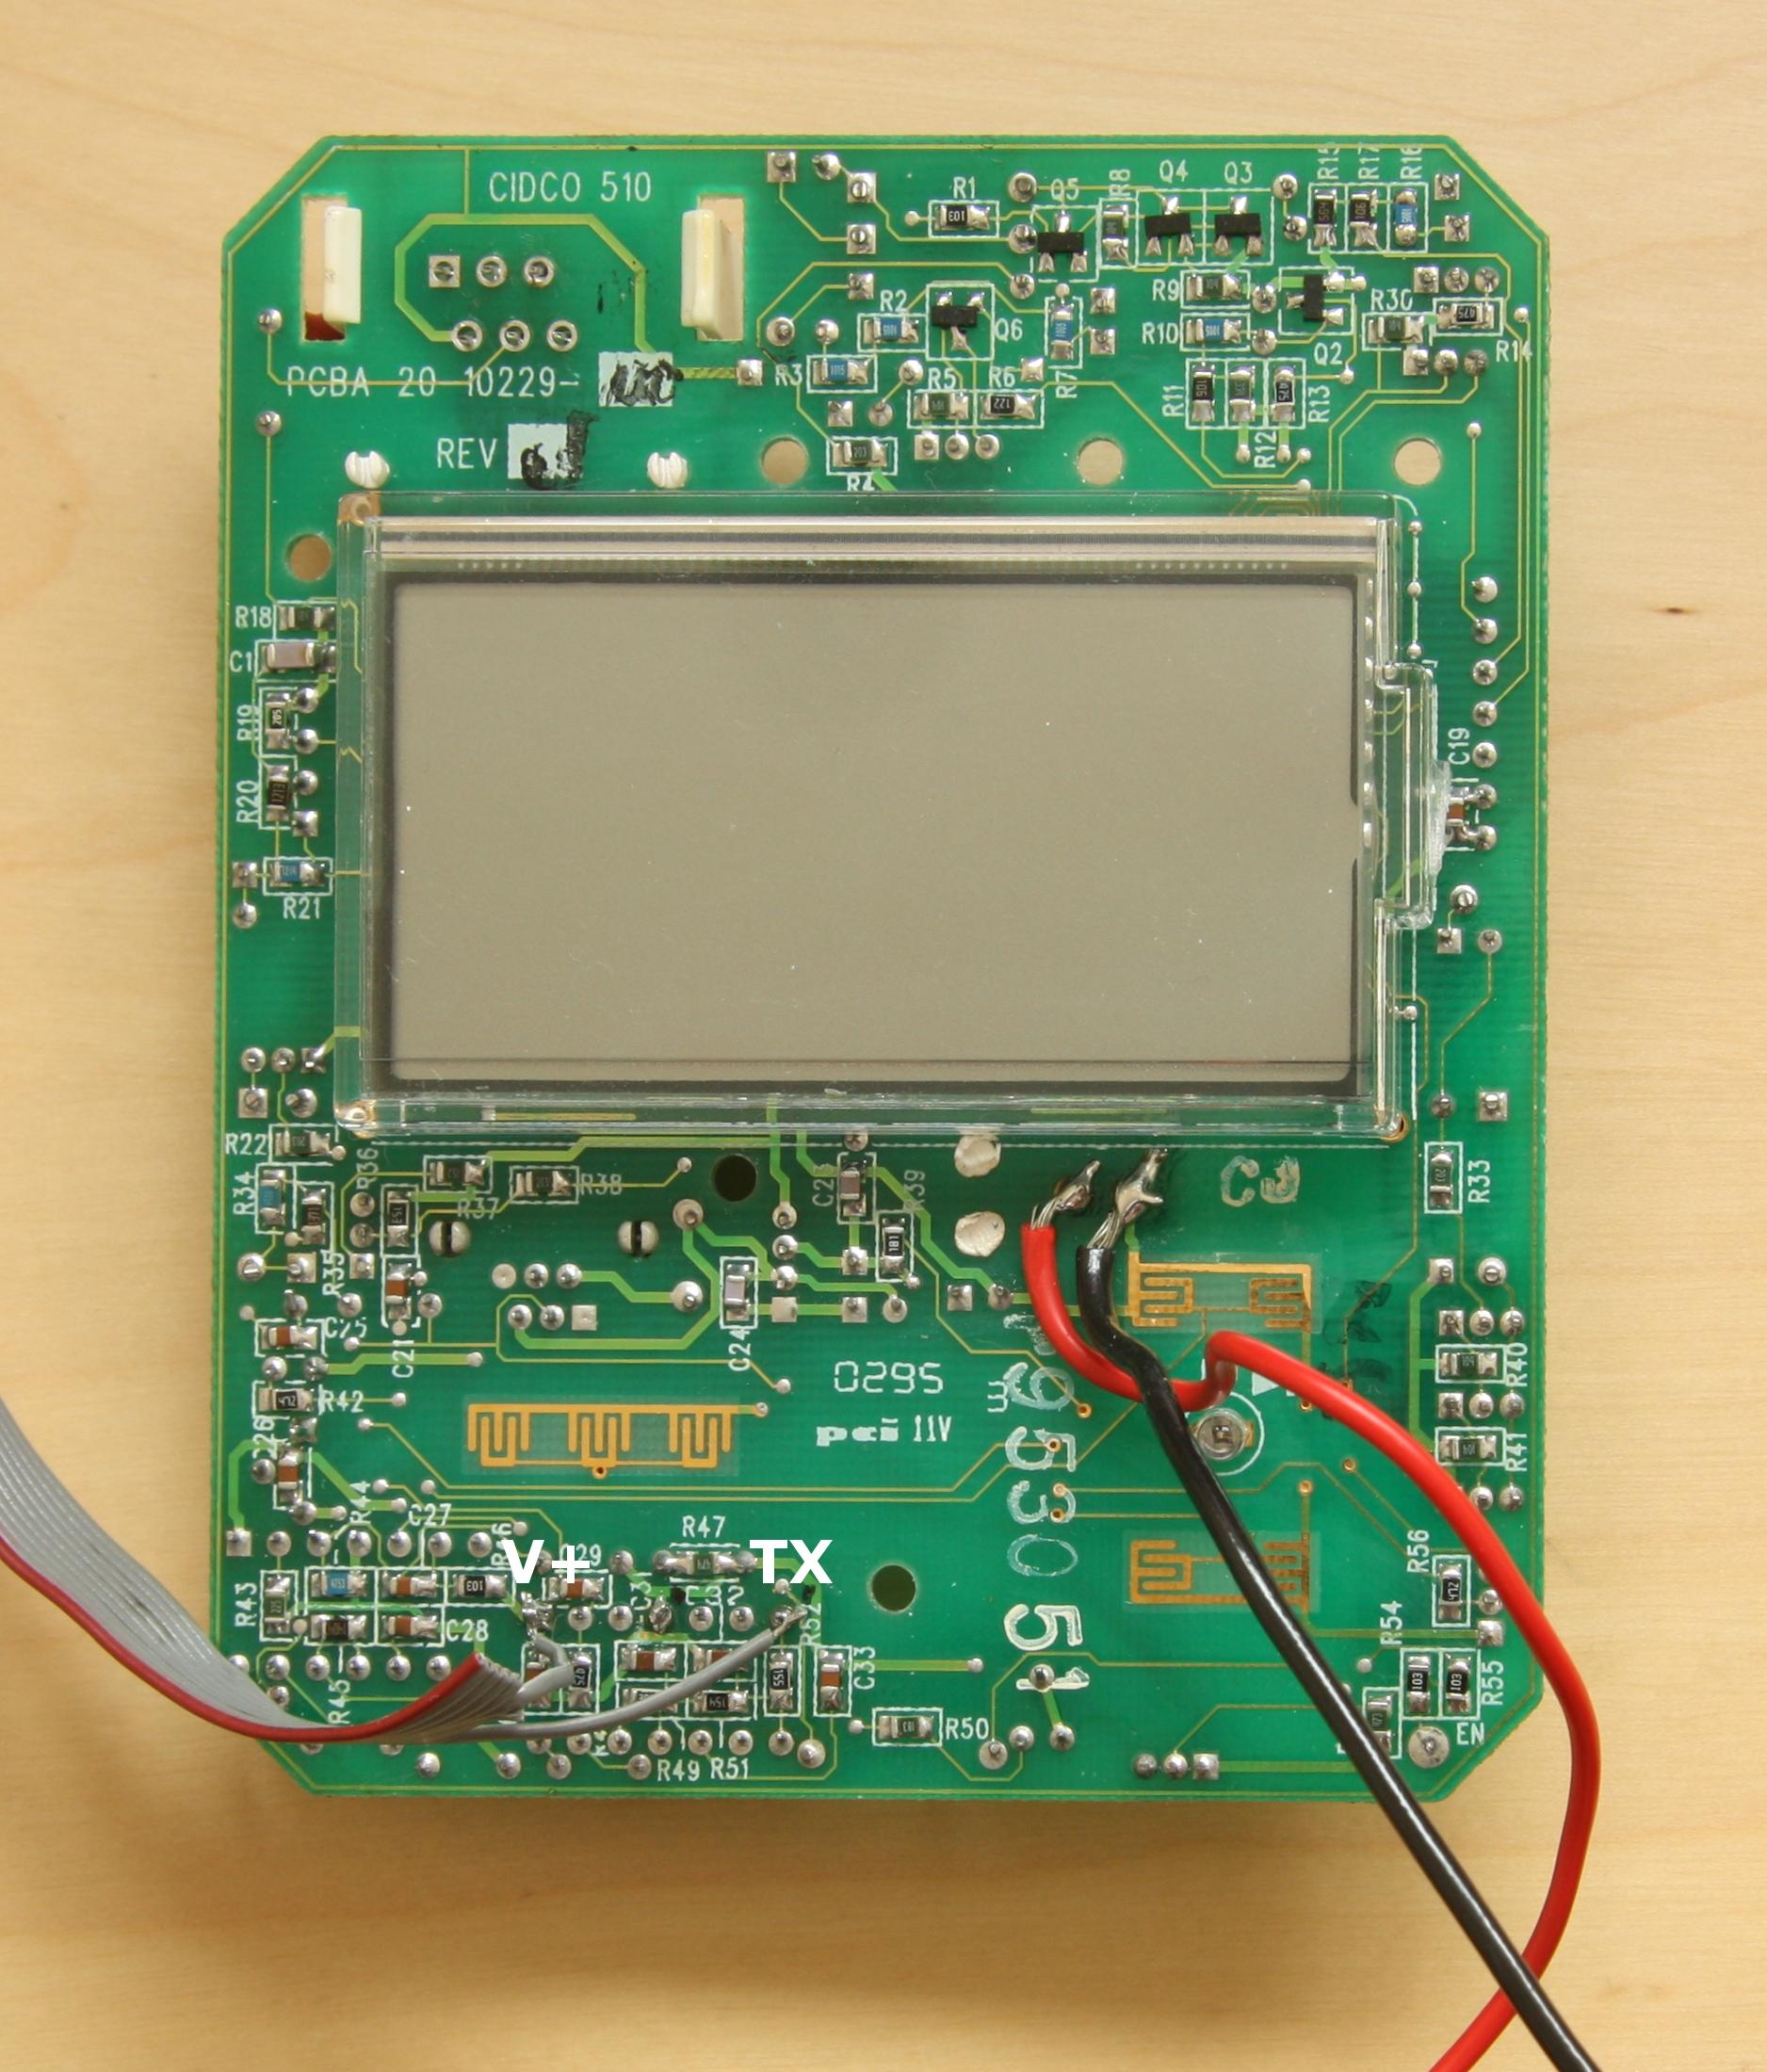 MQTT Caller Display - Hacking the BT Caller Display 50